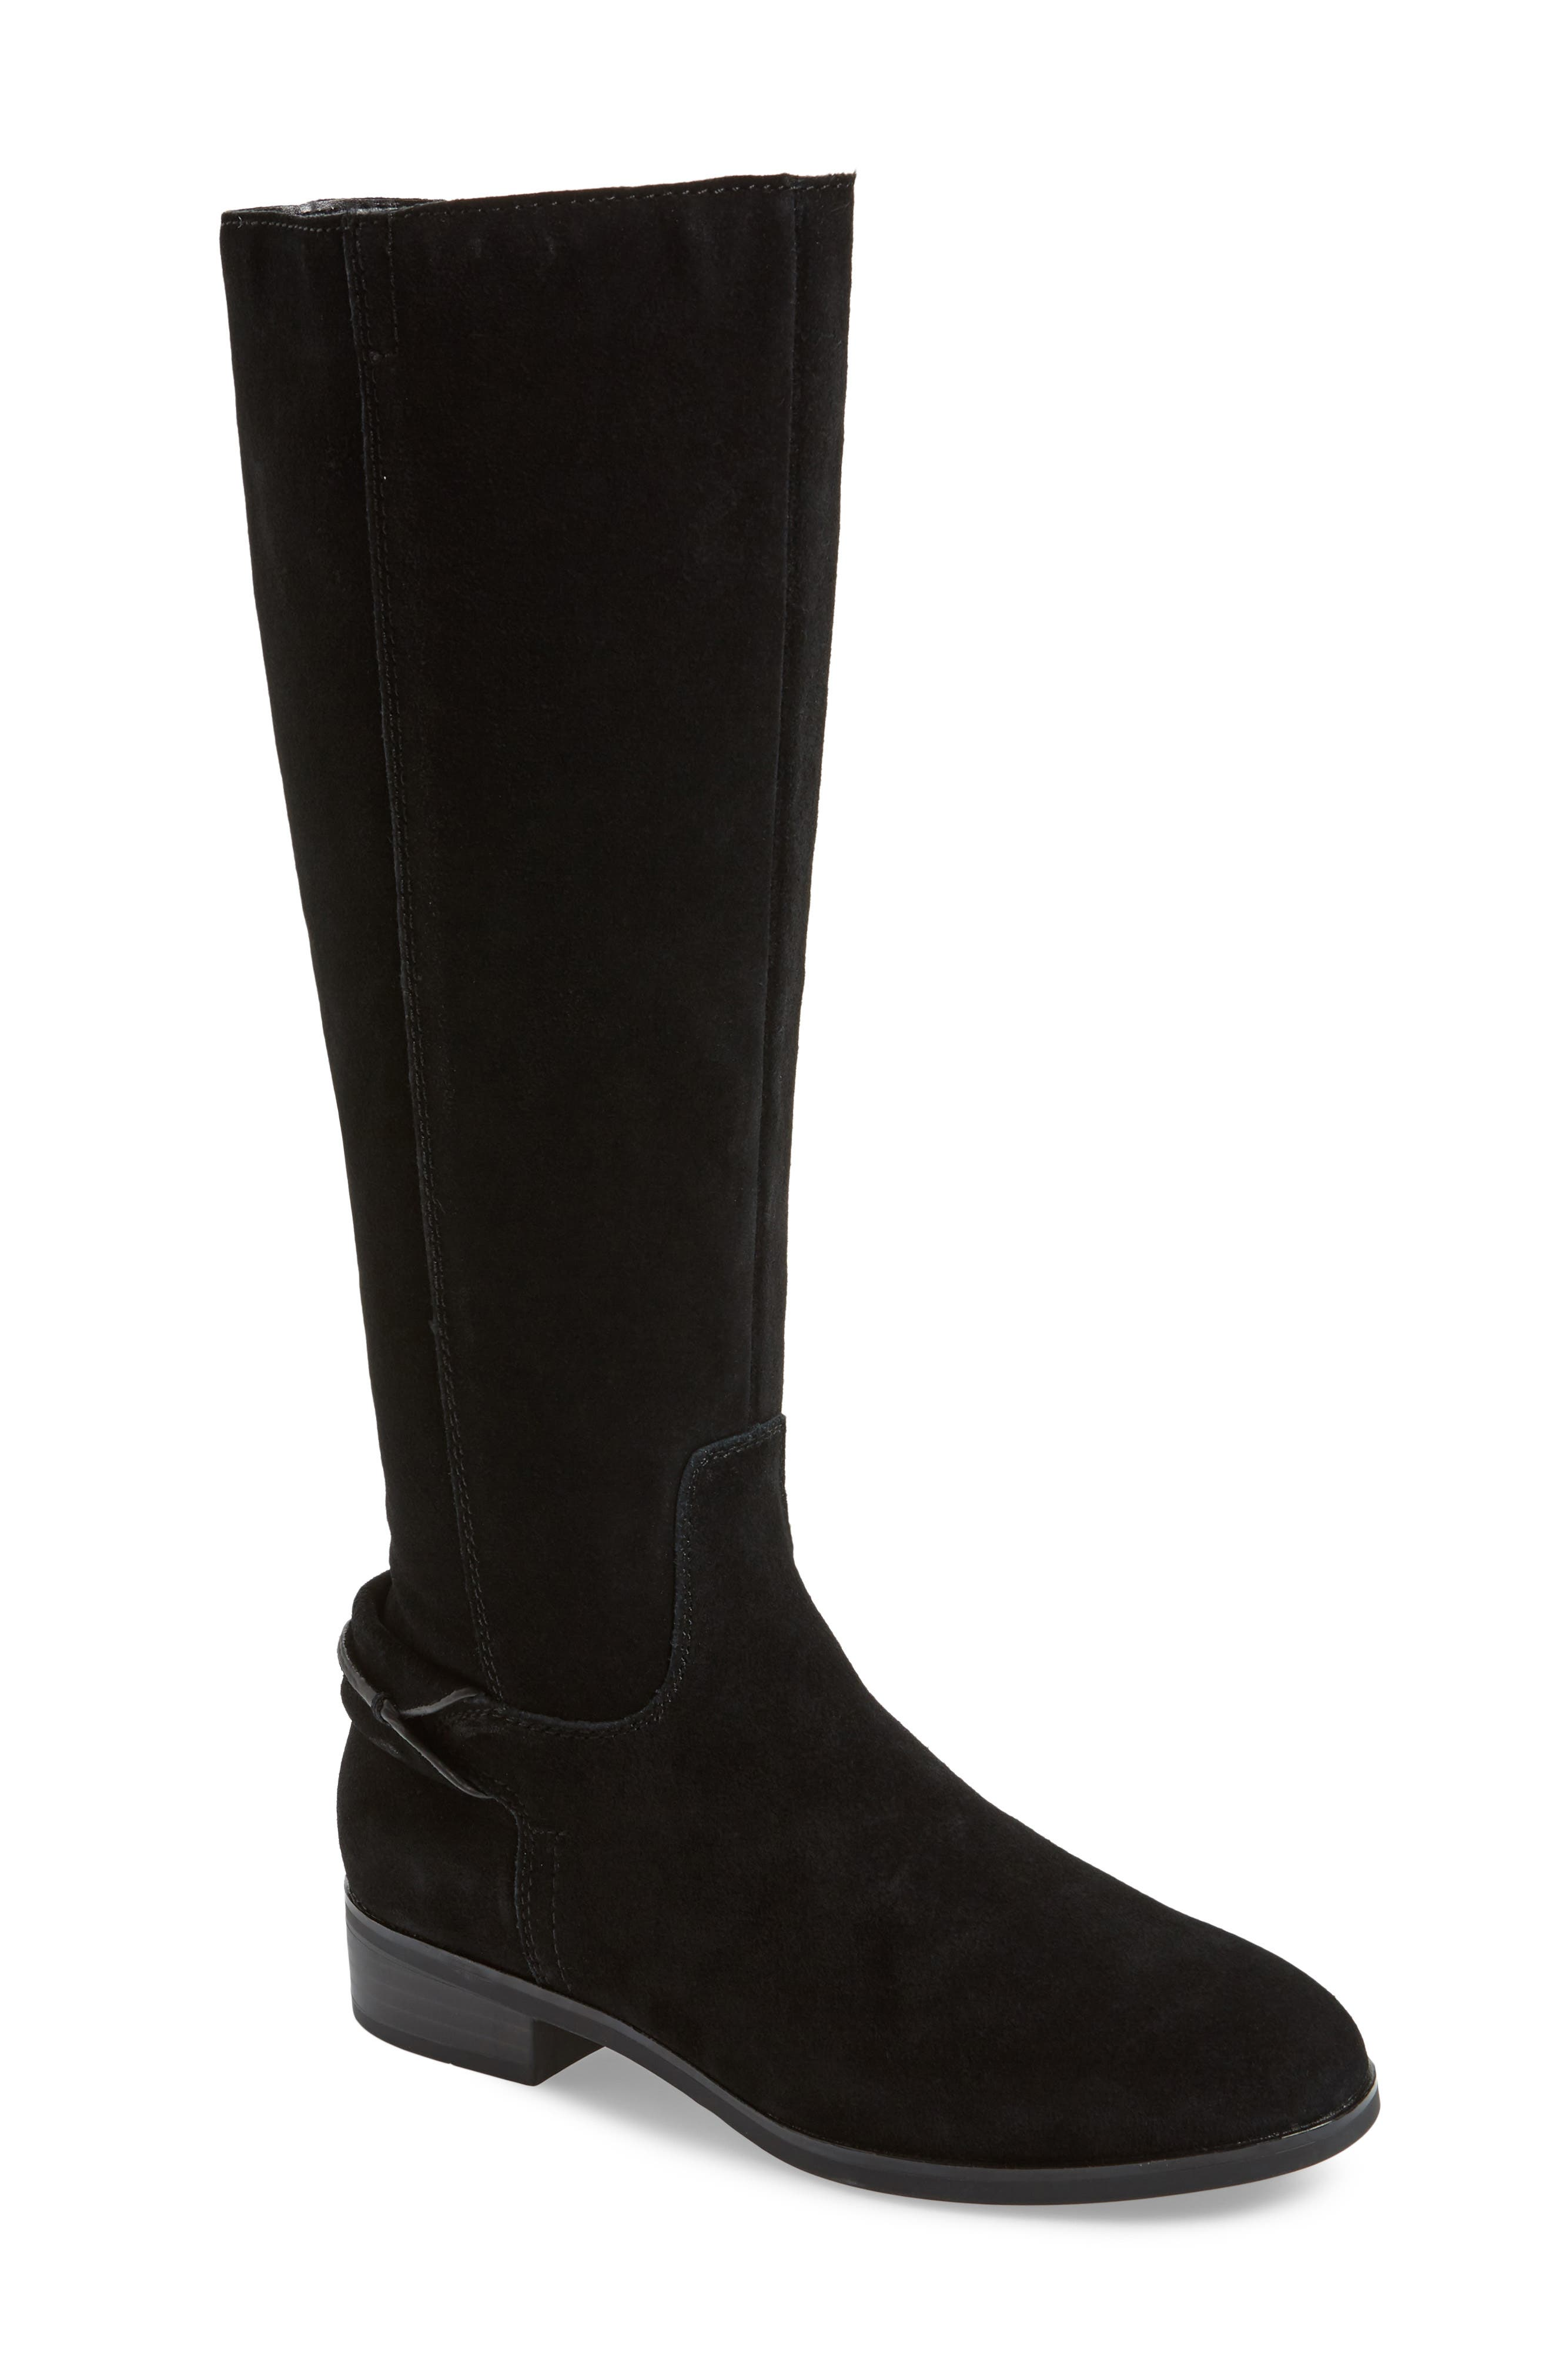 Kensie Cheverly Knee High Boot, Black